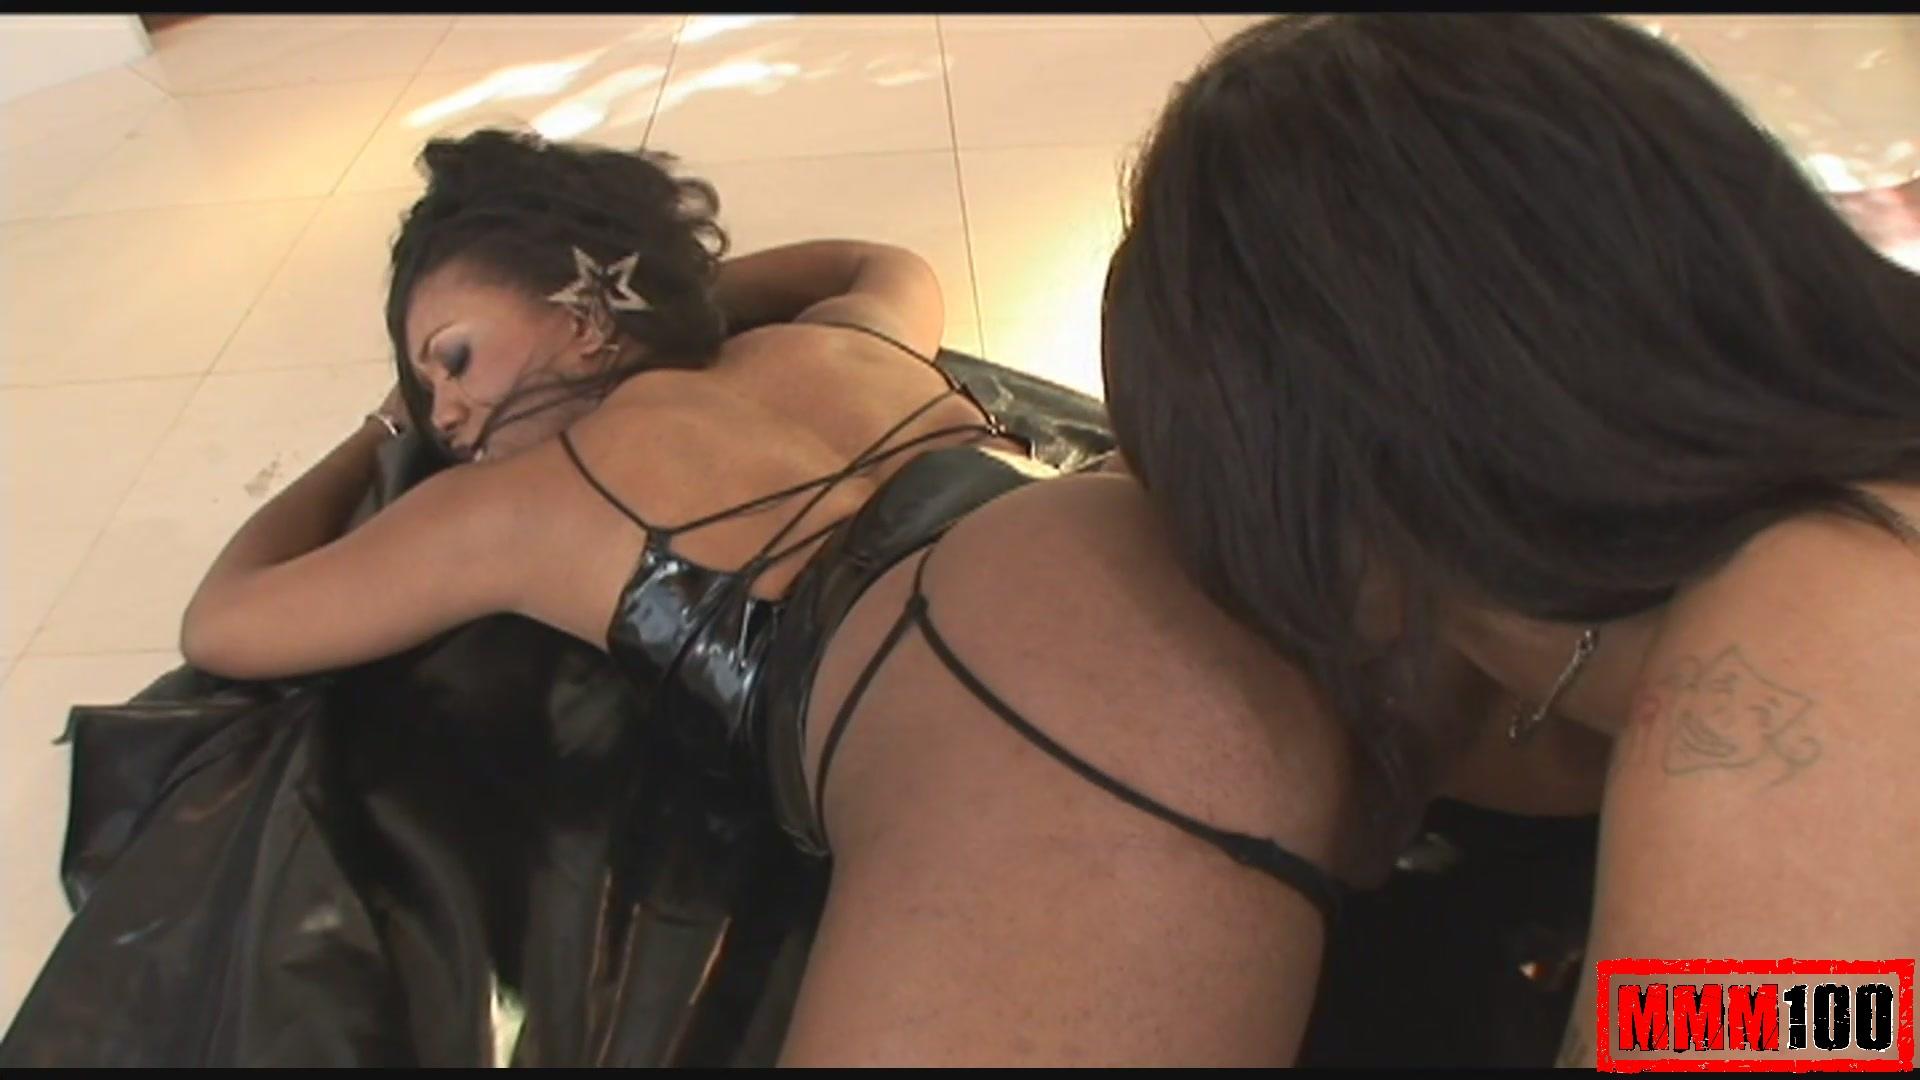 French Lesbian Anal Threesome